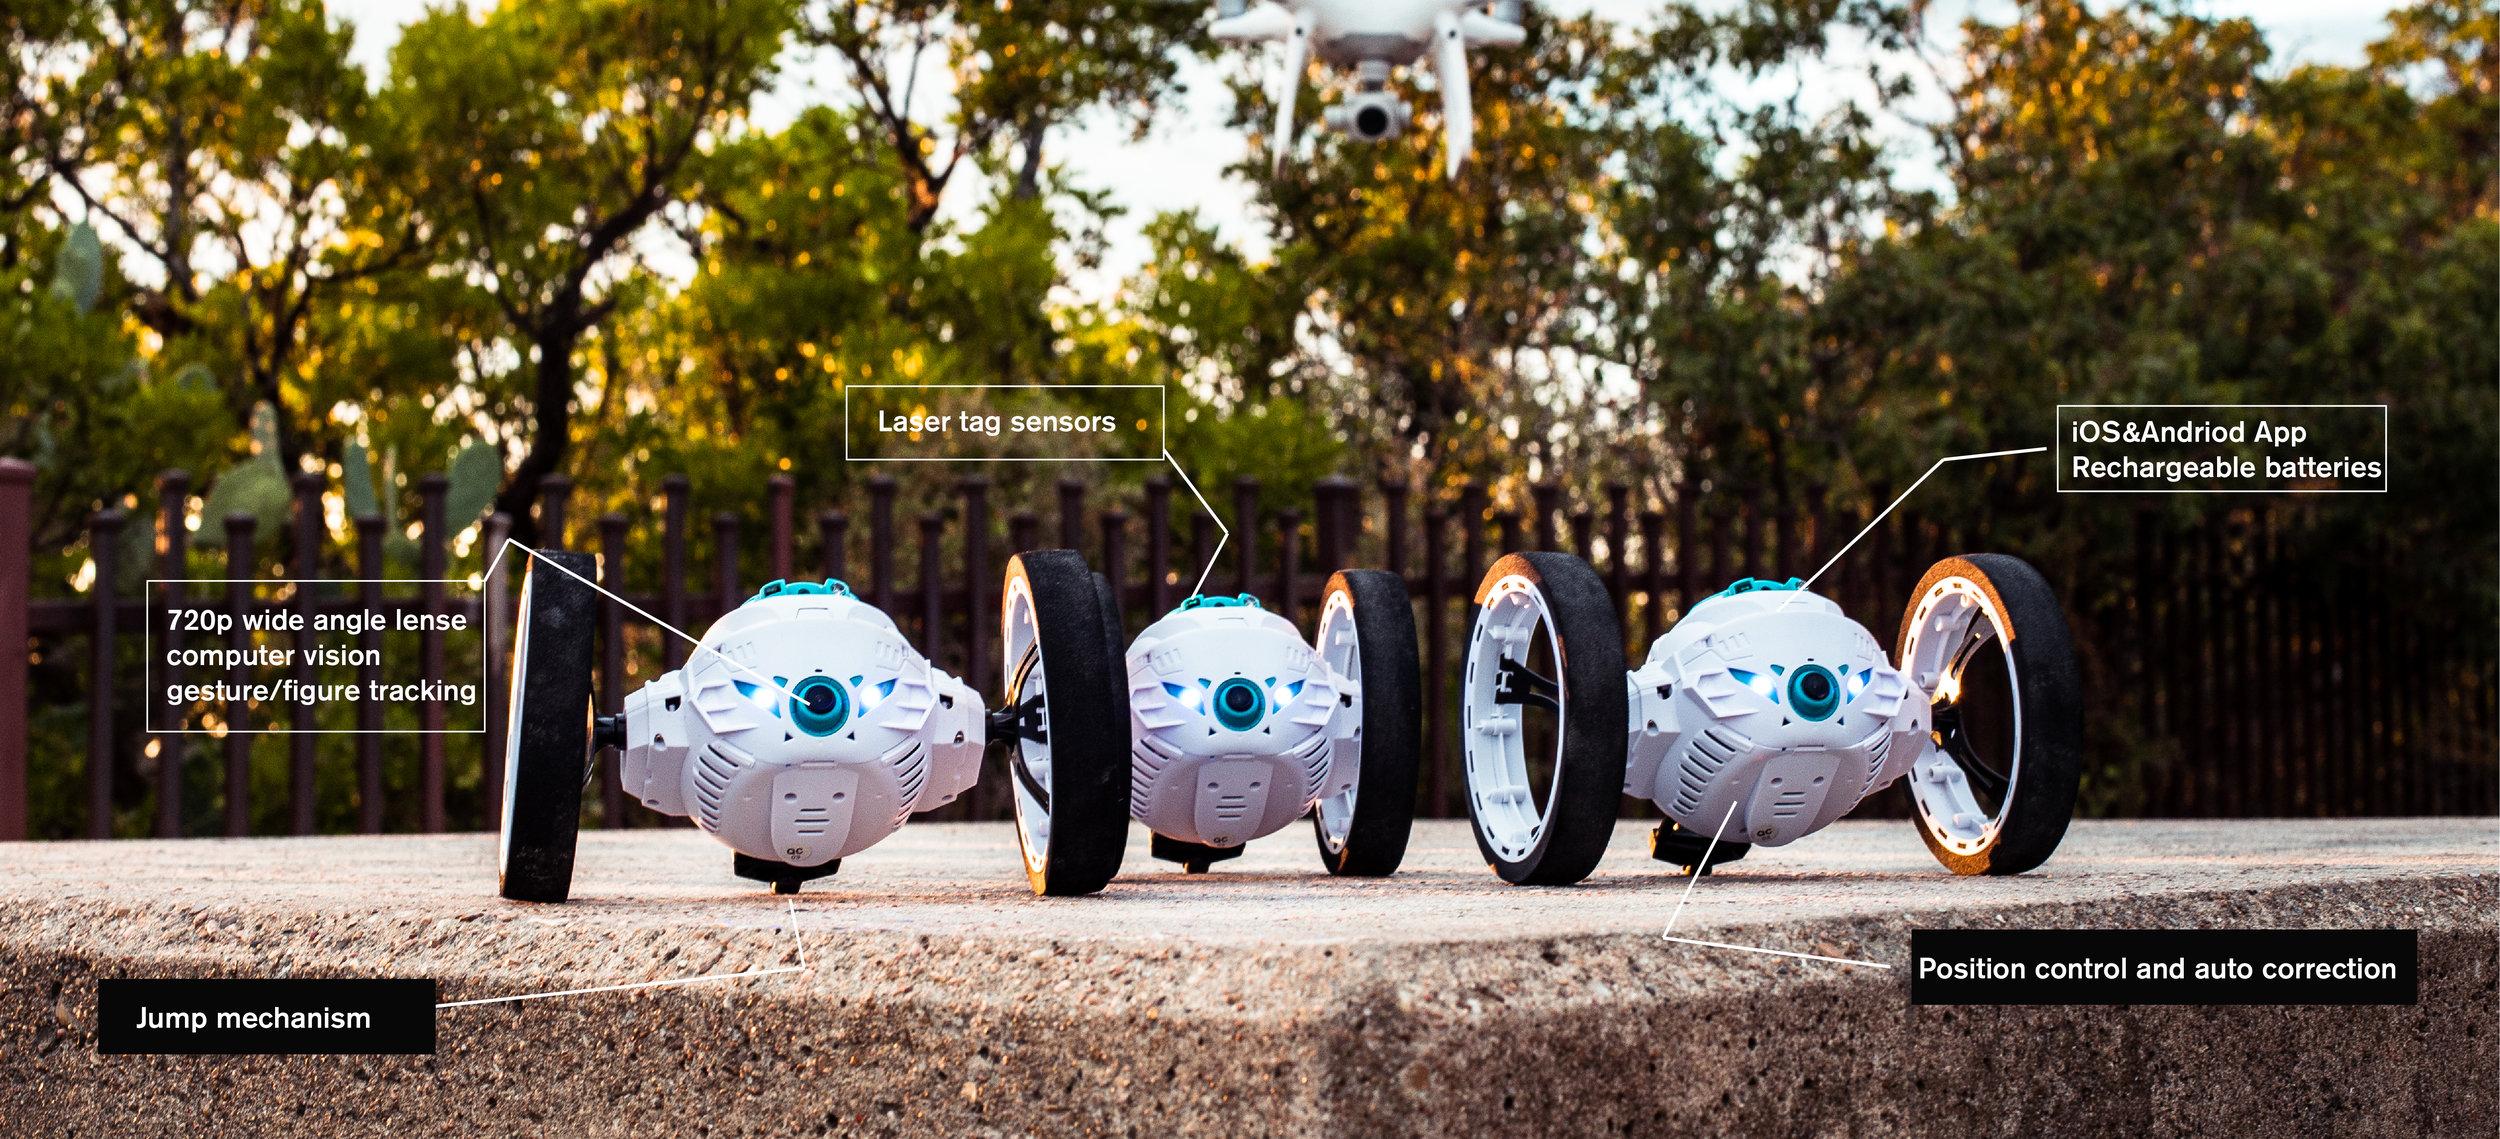 Jukibot robot cutouts